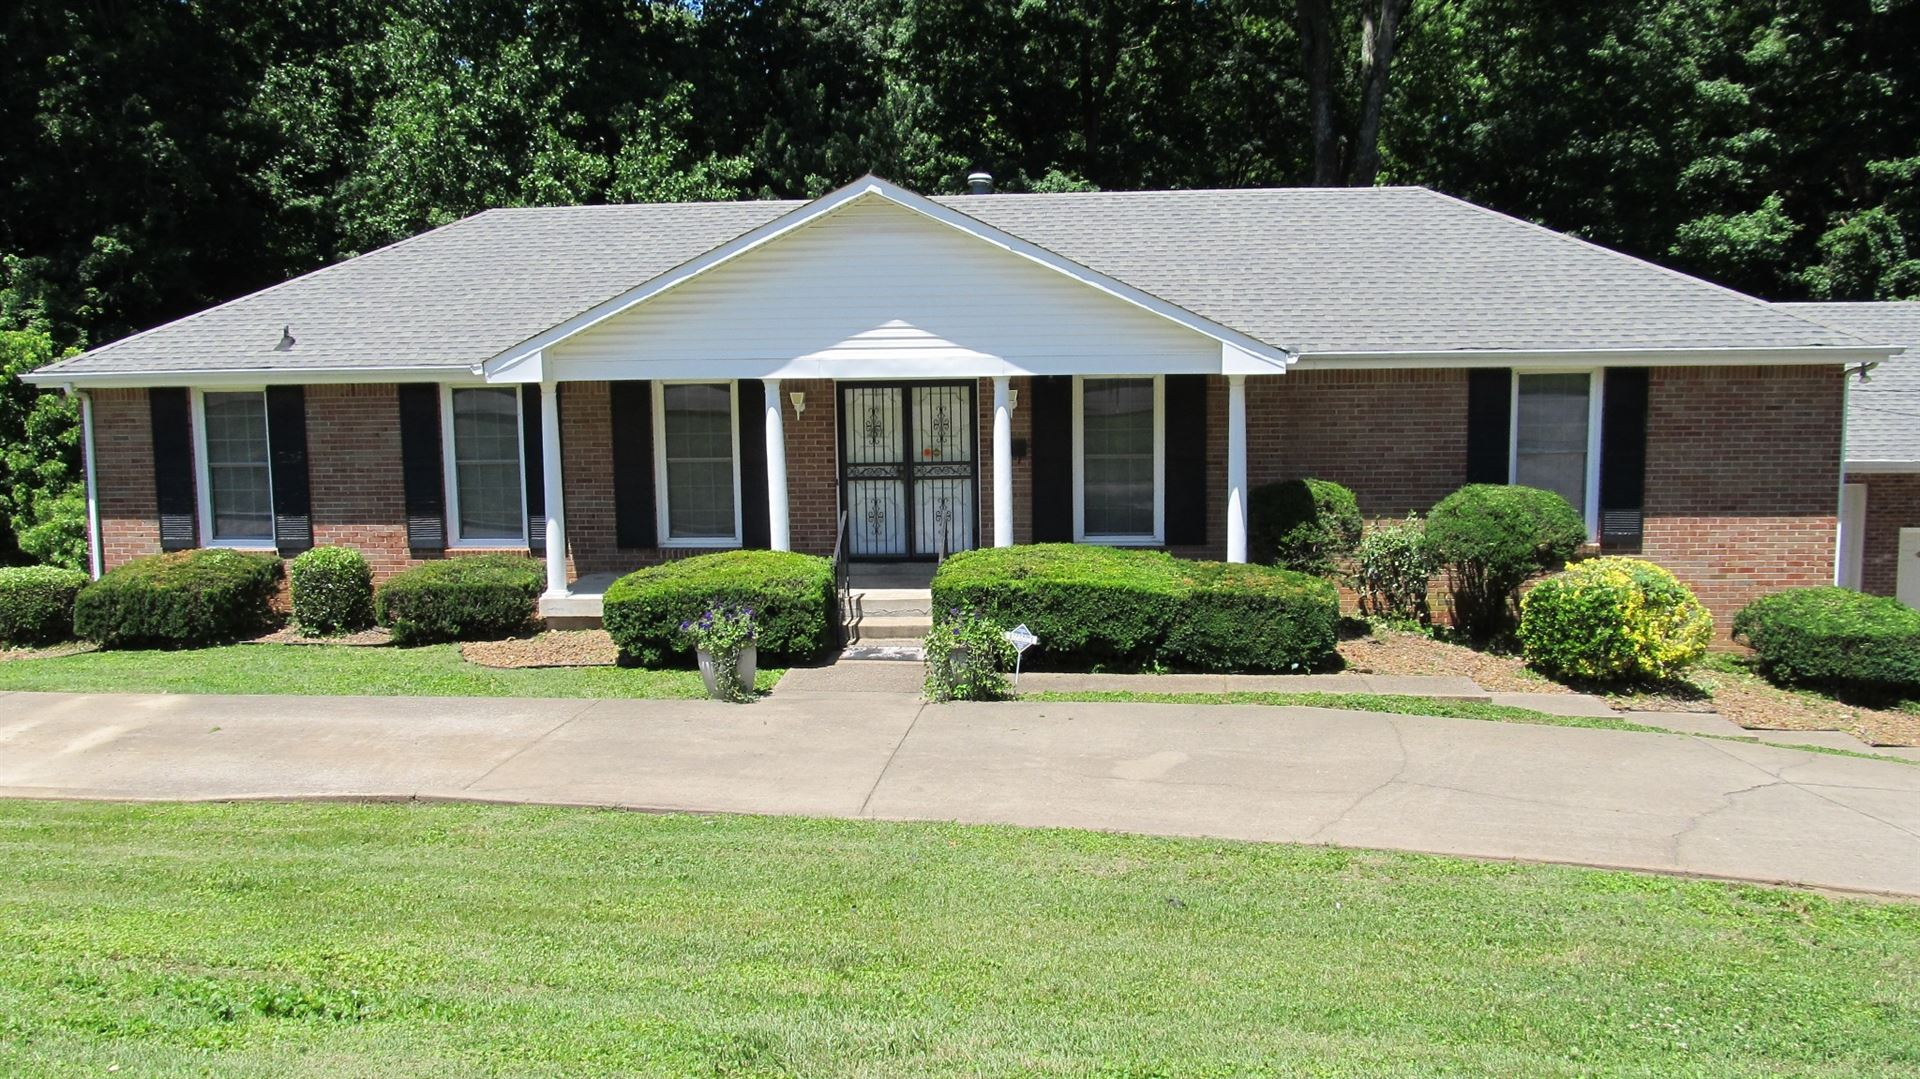 251 E Porters Bluff Rd, Clarksville, TN 37040 - MLS#: 2184868